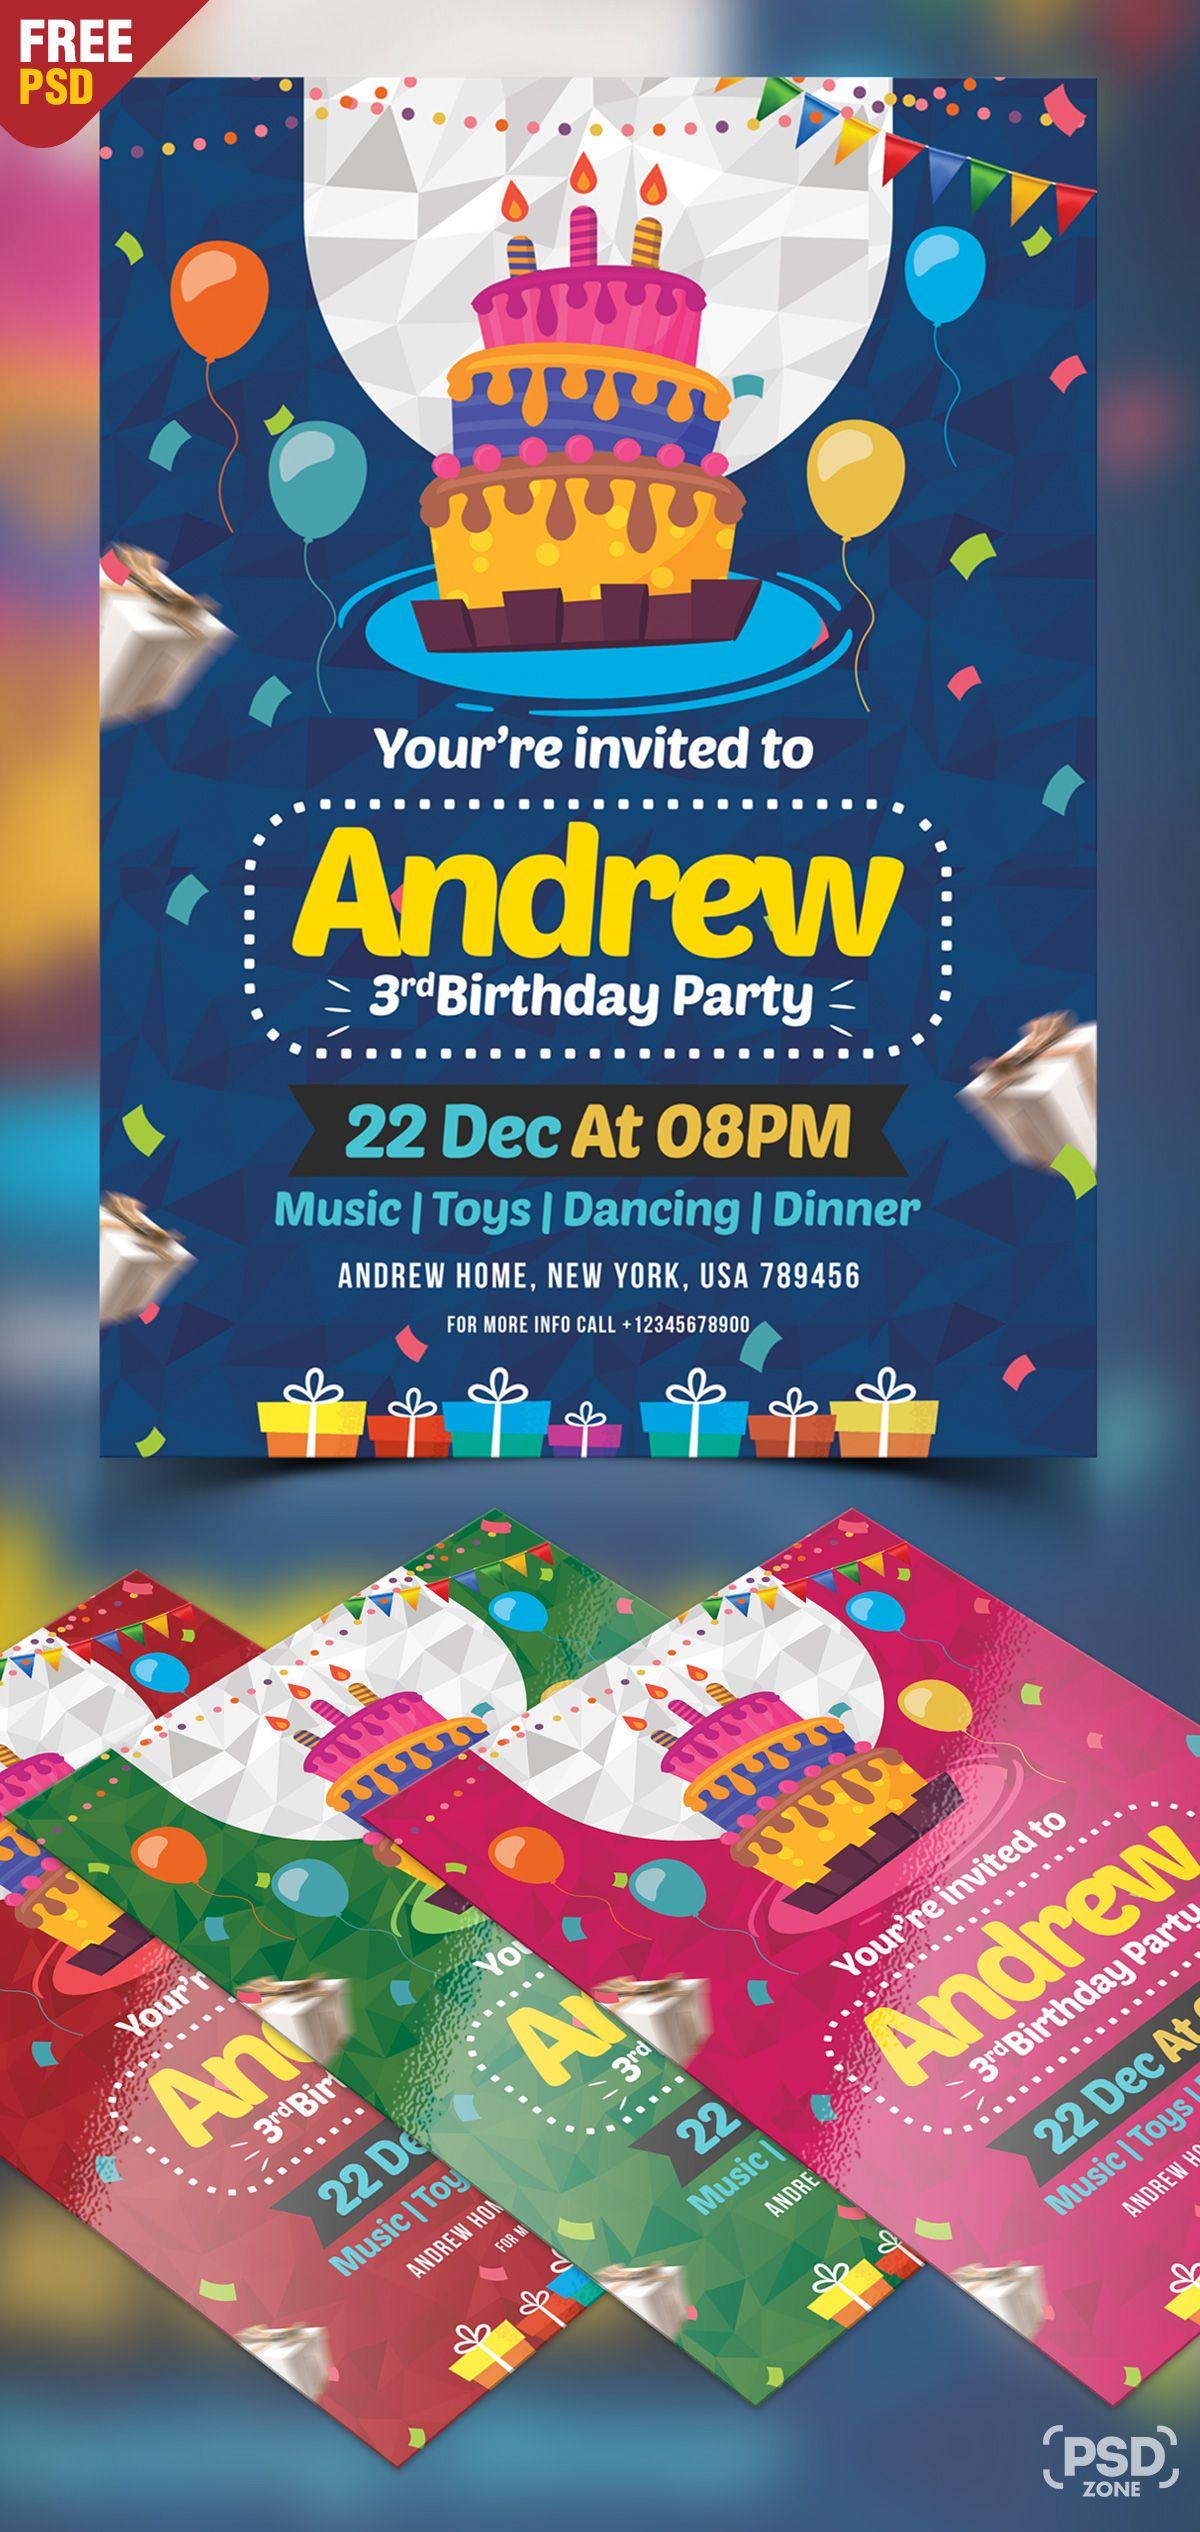 Birthday invitation card design free psd free psd flyer in 2018 birthday invitation card design free psd free psd flyer invitation card design invitation cards filmwisefo